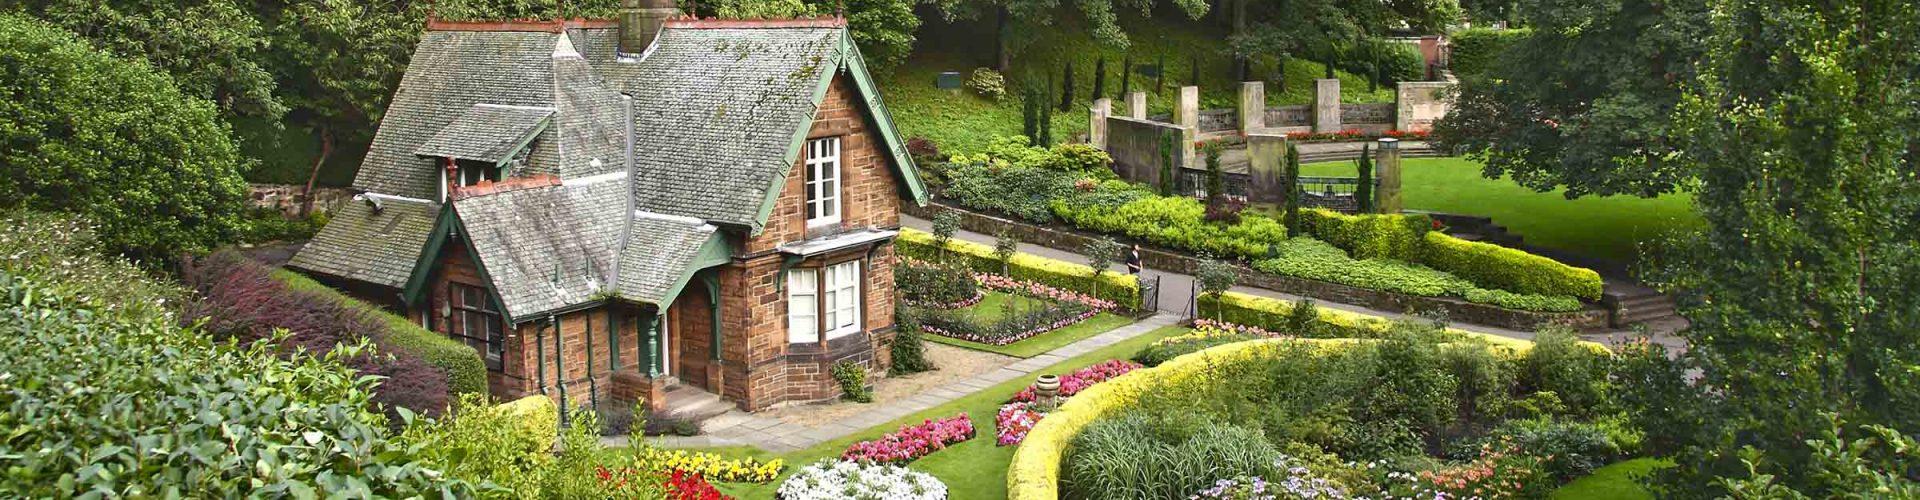 A quaint old house in Princes Street Gardens in Edinburgh